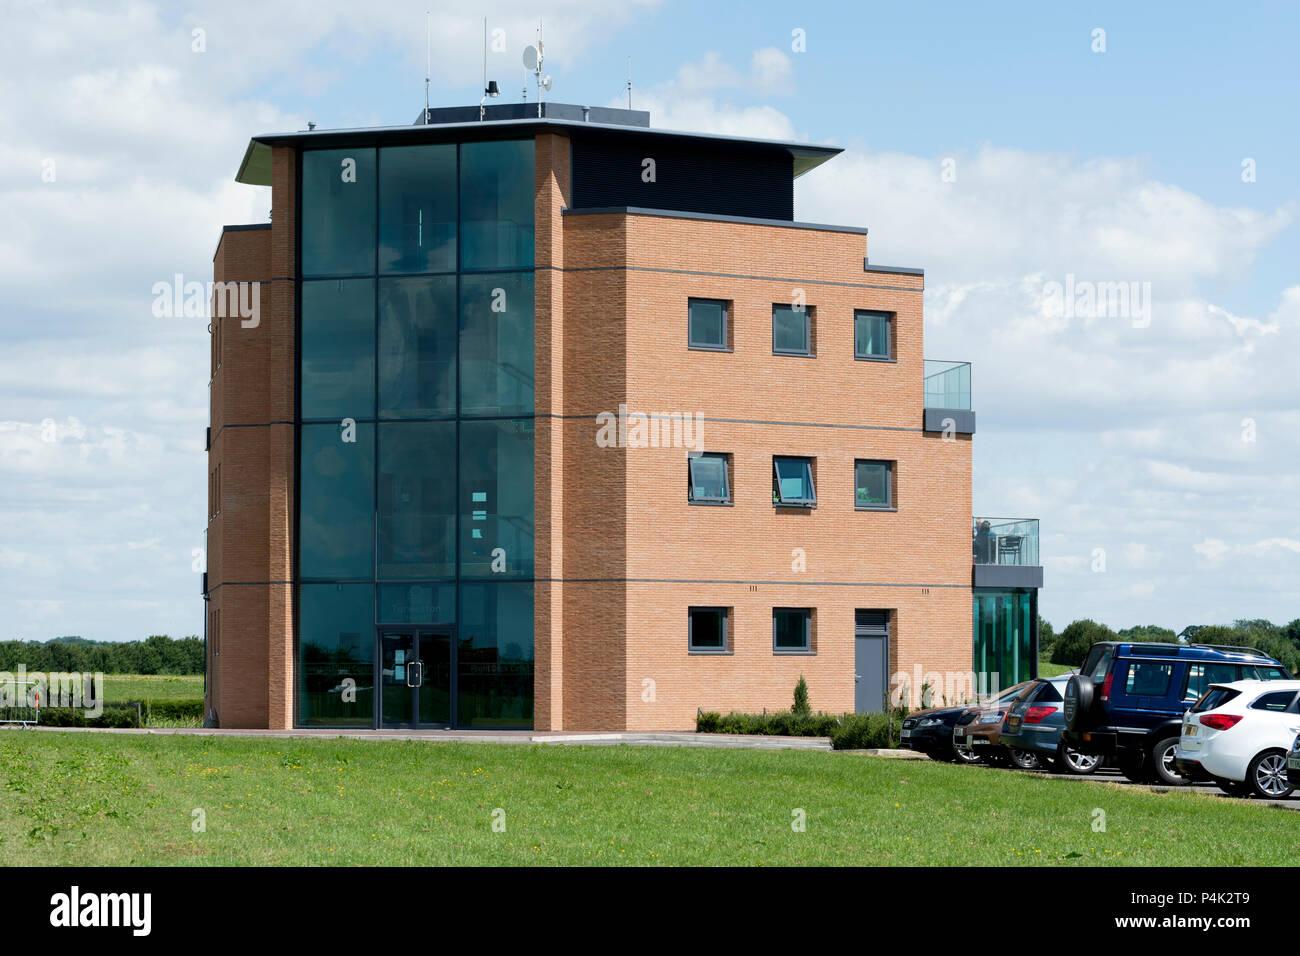 The new control tower building, Turweston Aerodrome, Buckinghamshire, England, UK - Stock Image